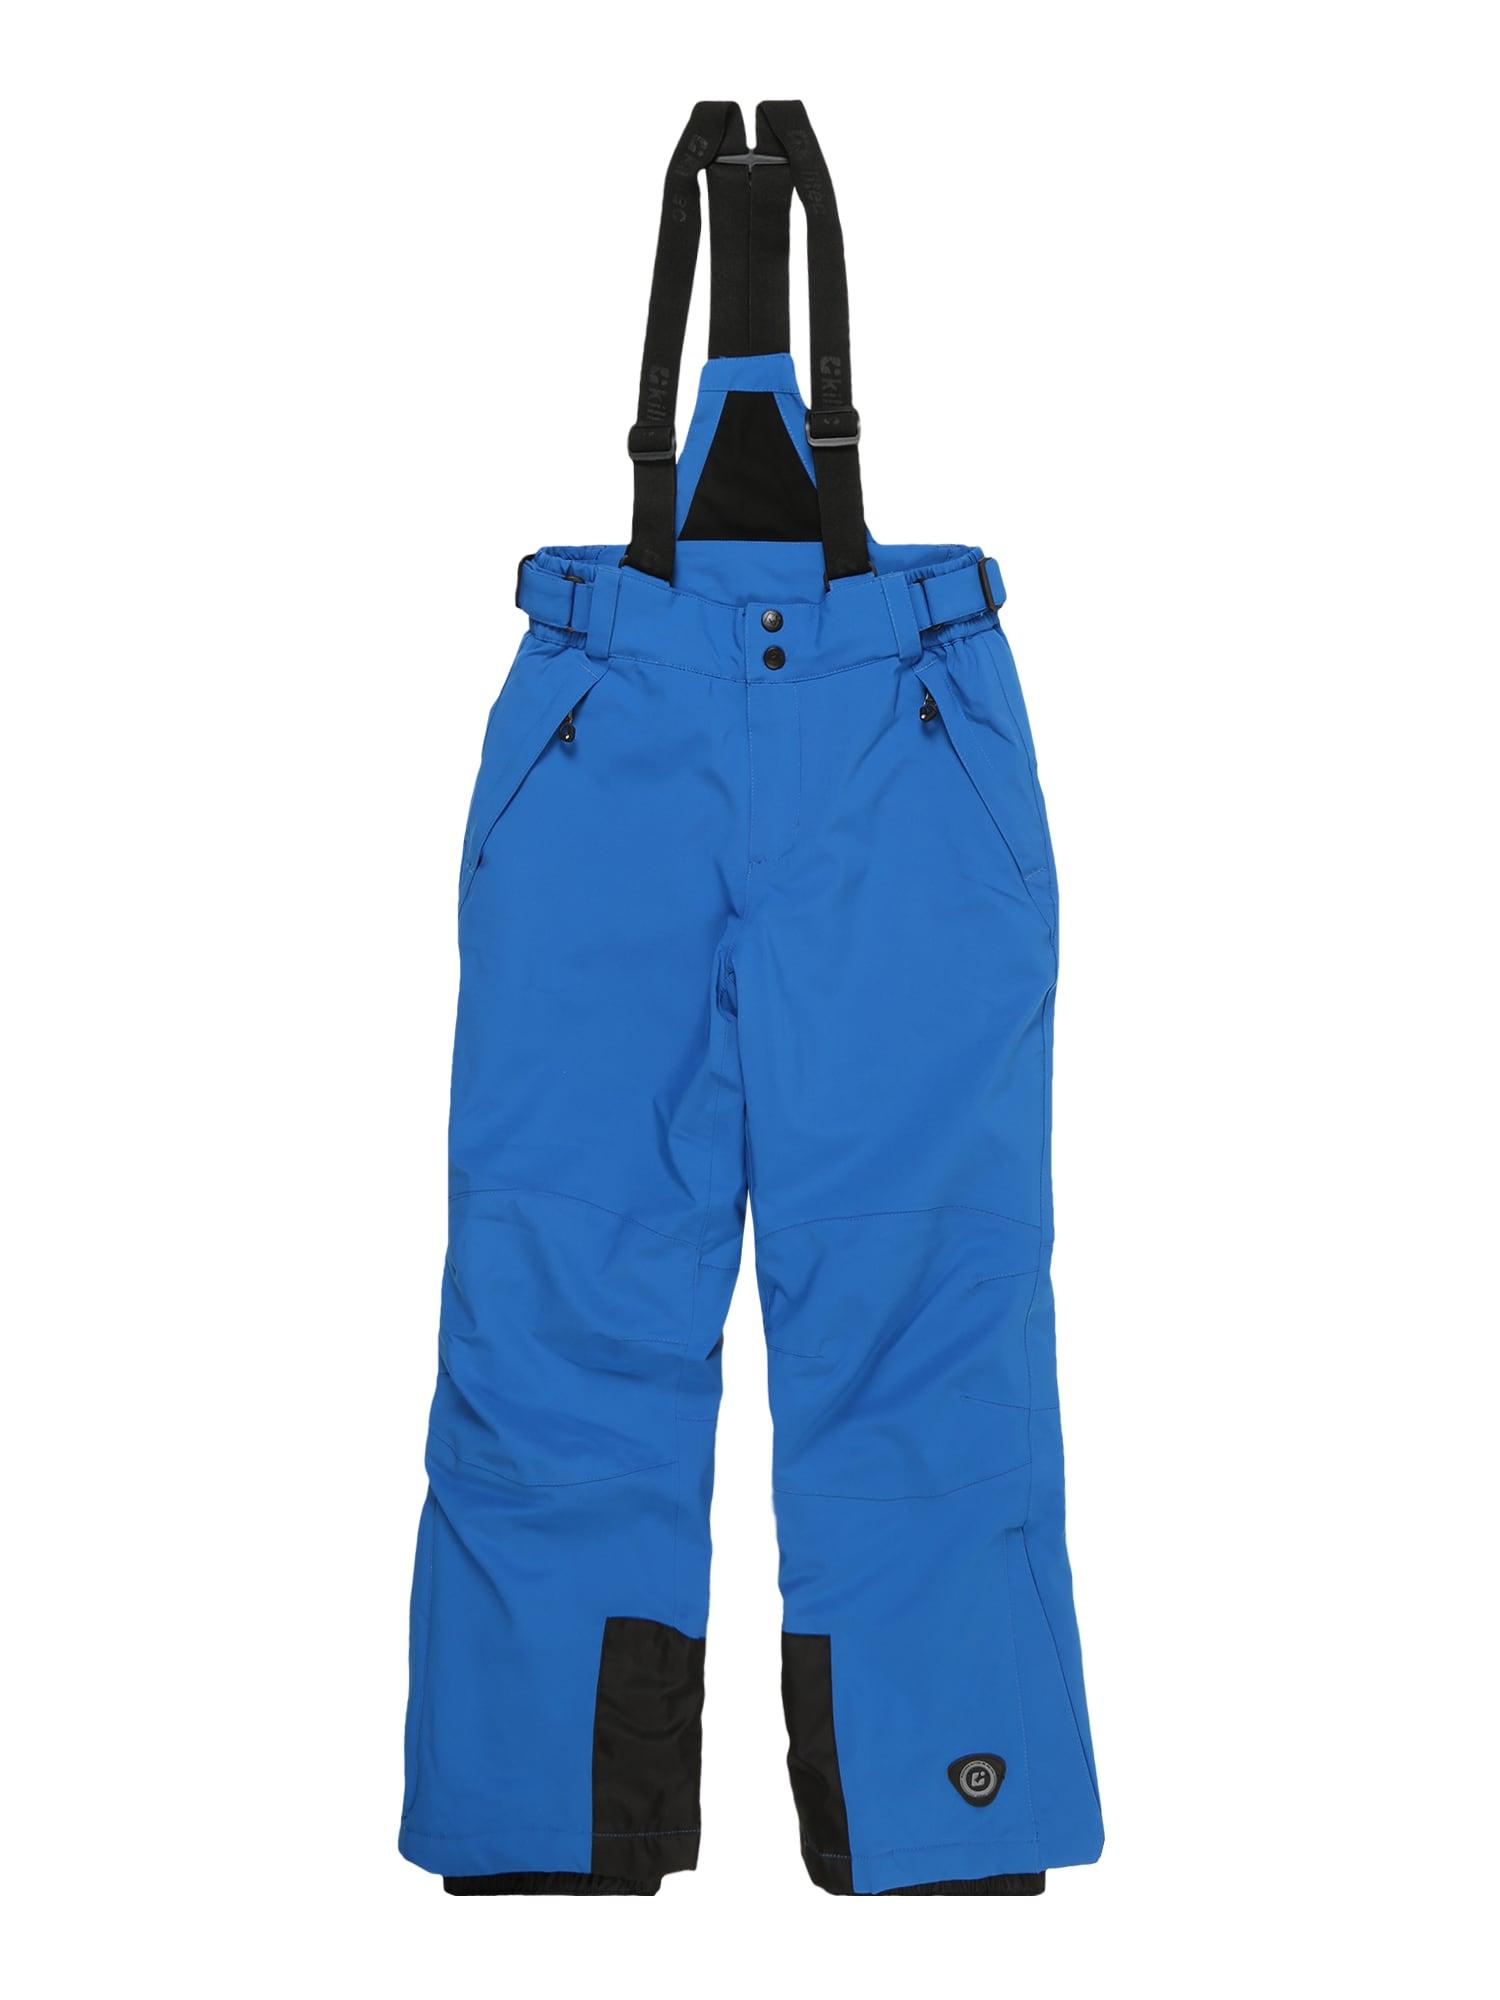 Outodoor kalhoty Gauror královská modrá KILLTEC